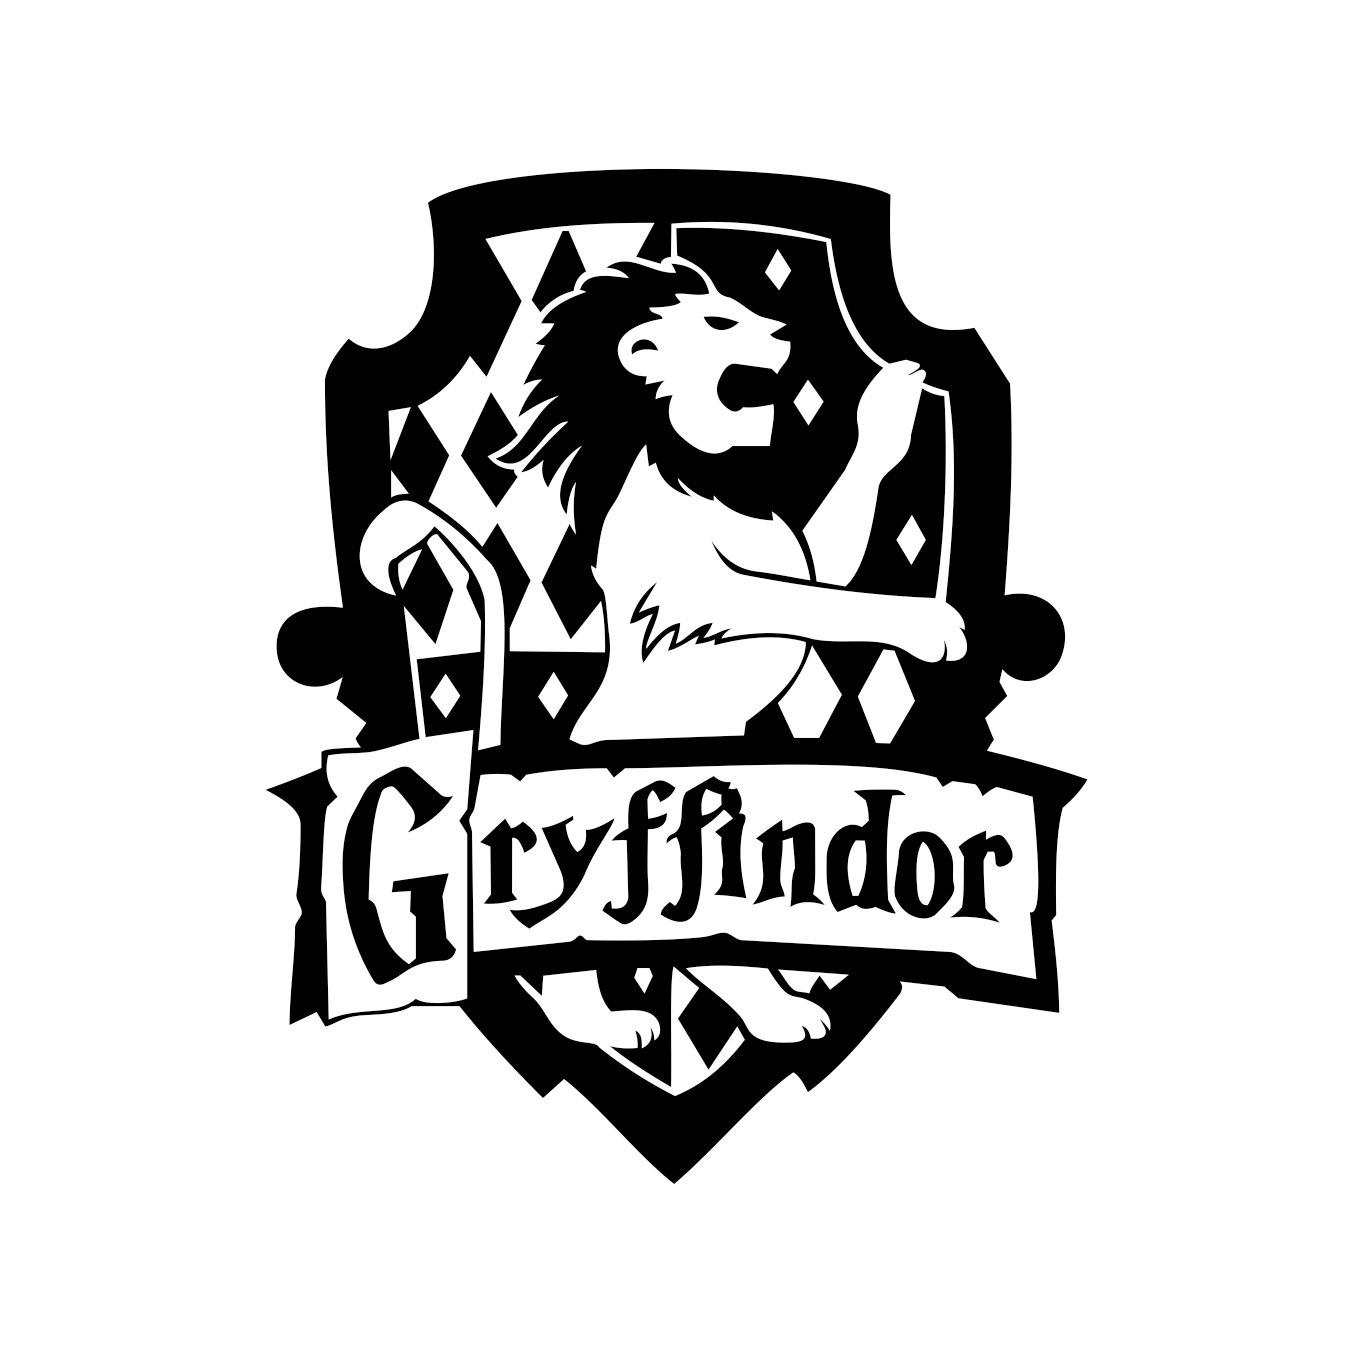 Gryffindor Harry Potter House Badge Crest By Vectordesign